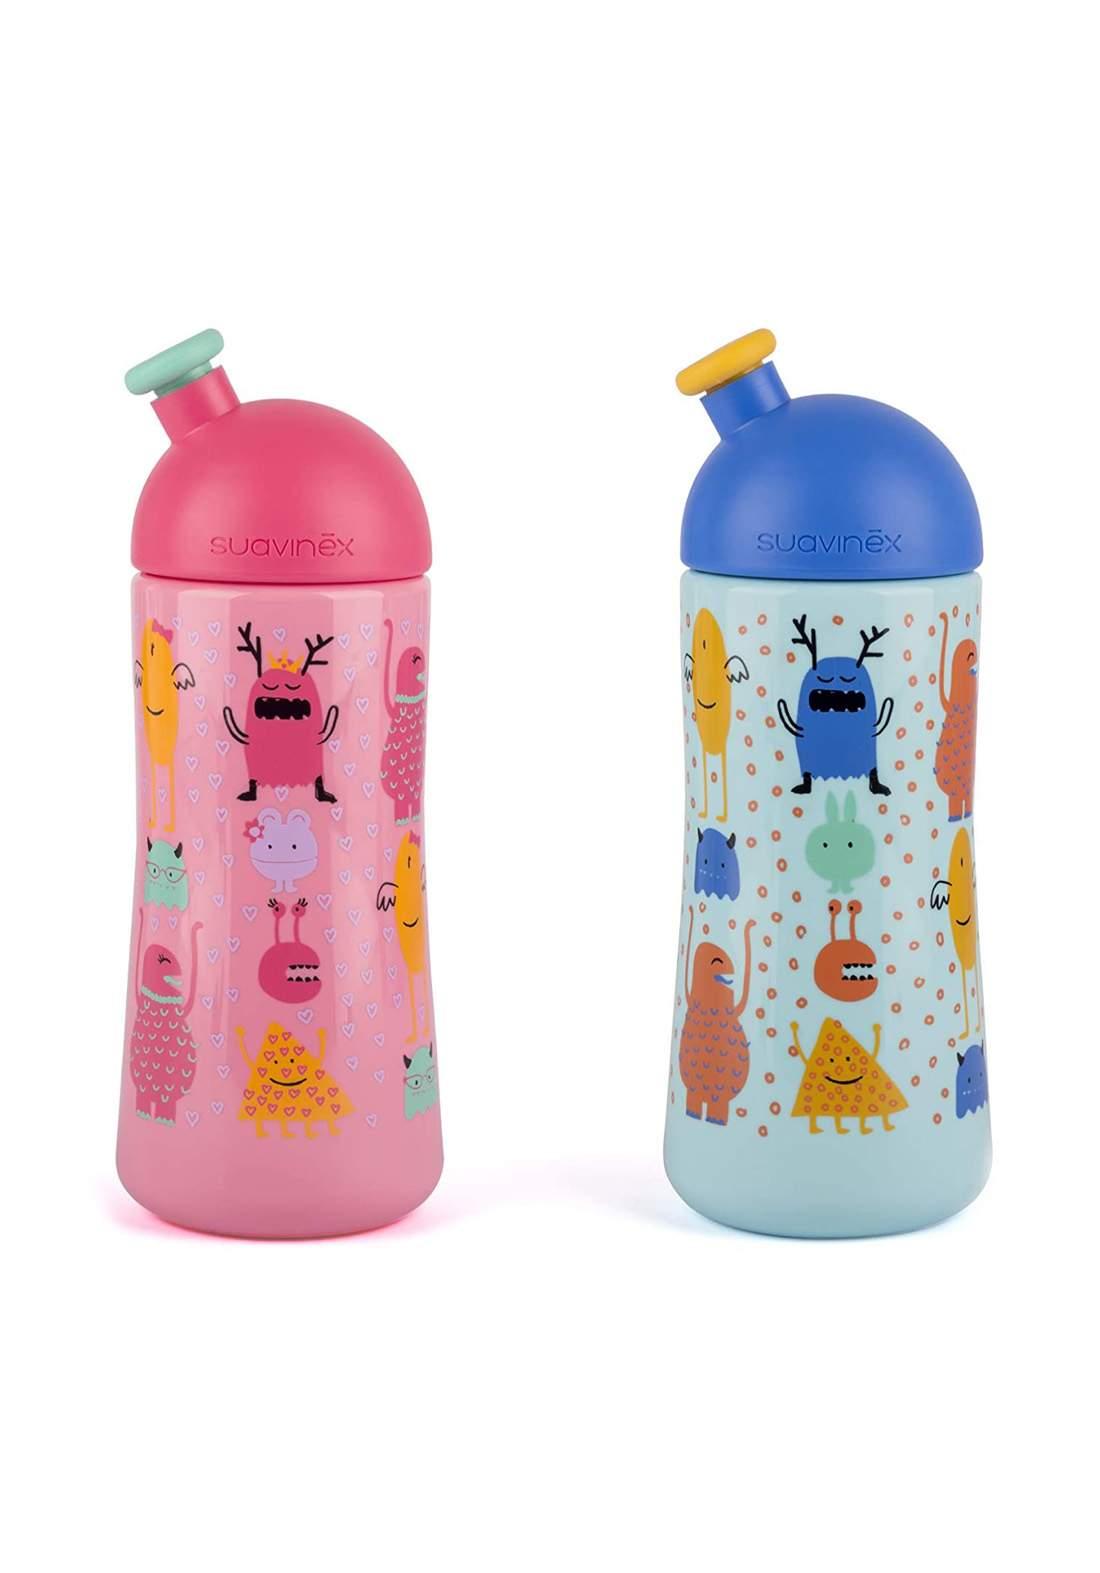 Suavinex Baby Bottle With Sporty Spout 360 ml قدح للاطفال